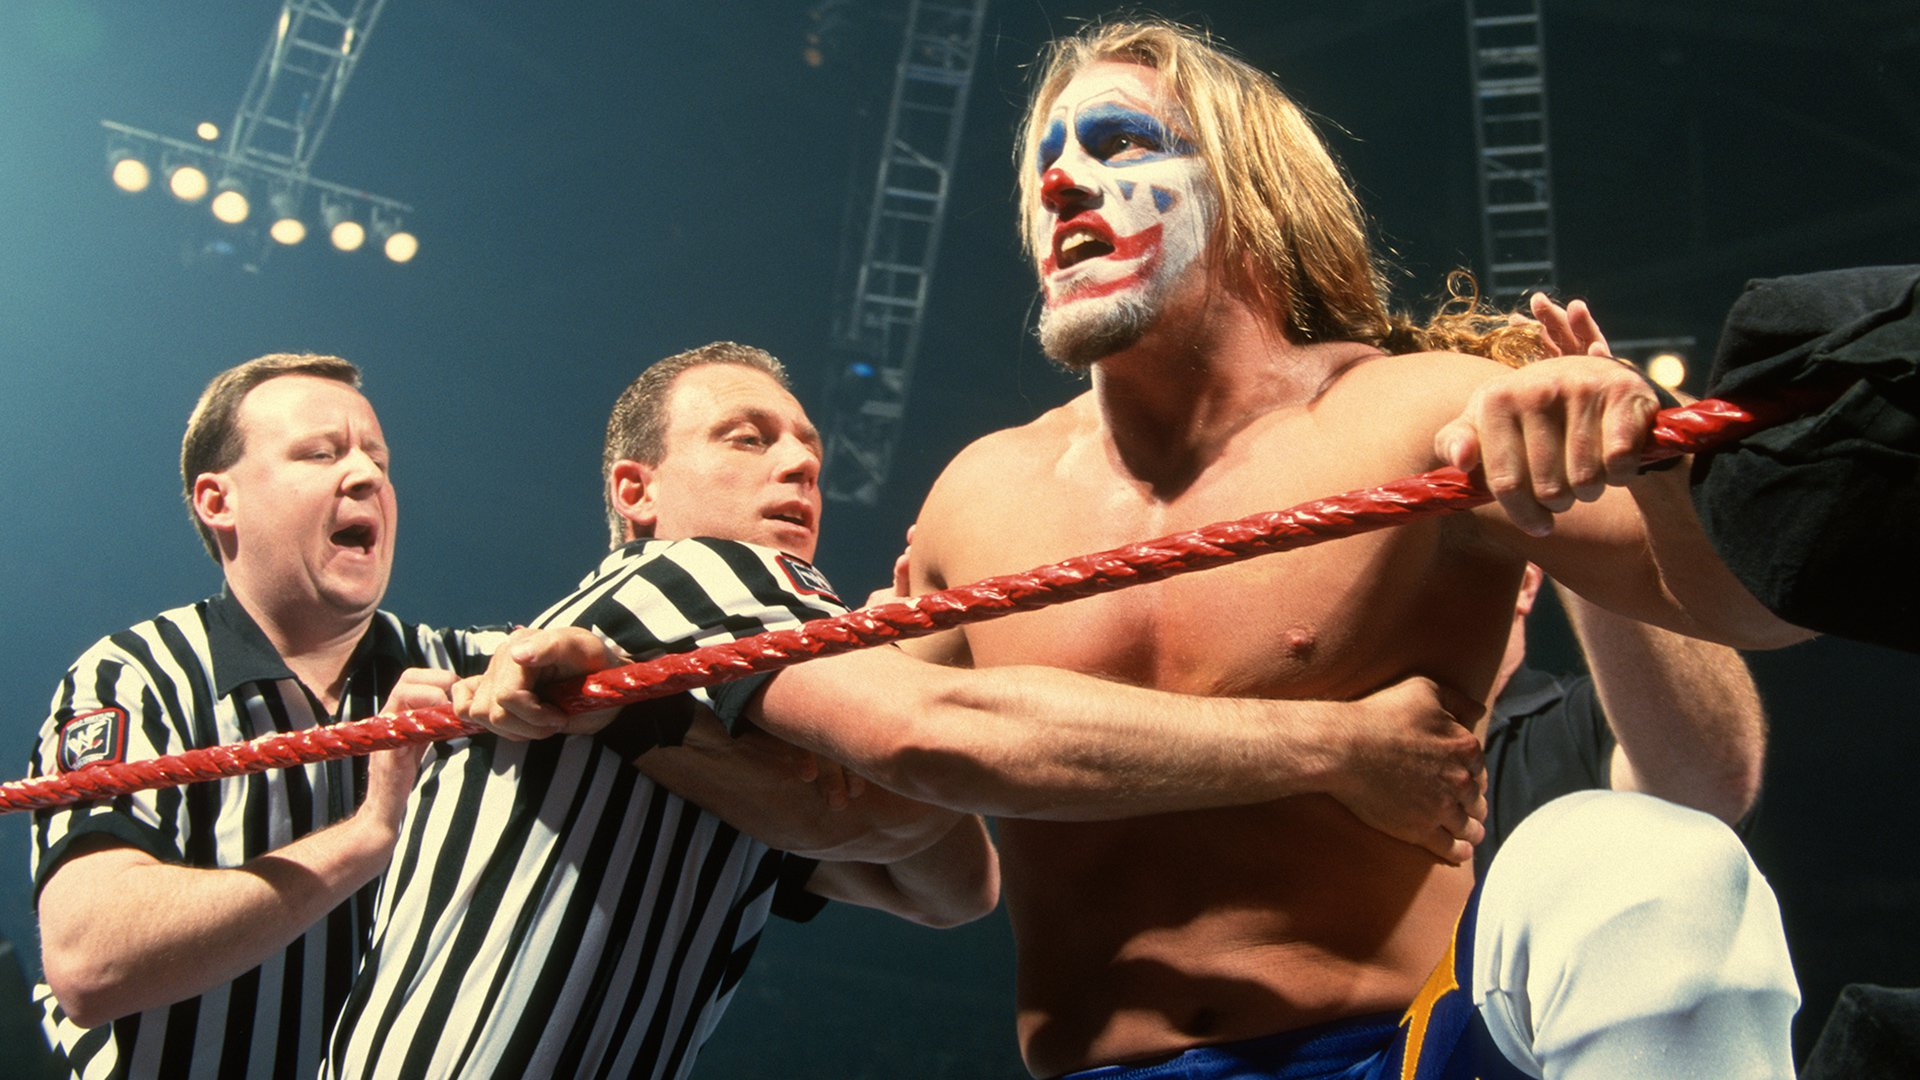 Chris Jericho as Doink the Clown